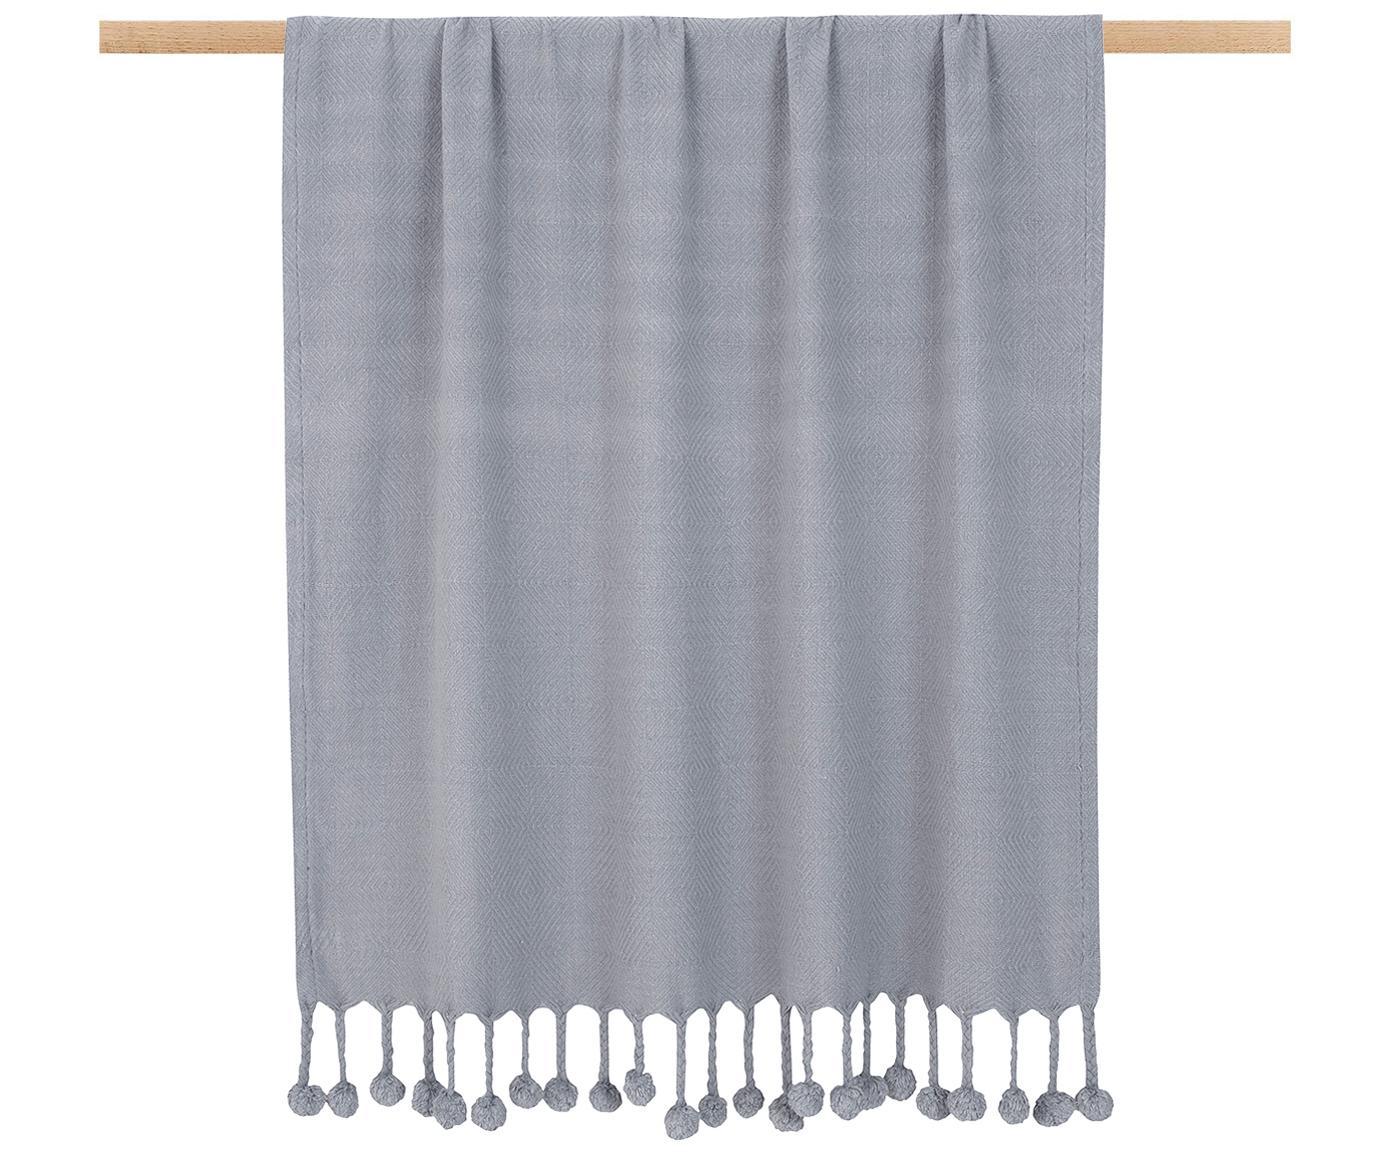 Plaid Sorbet in Grau mit Pompoms, 100% Baumwolle, Hellgrau, 130 x 170 cm